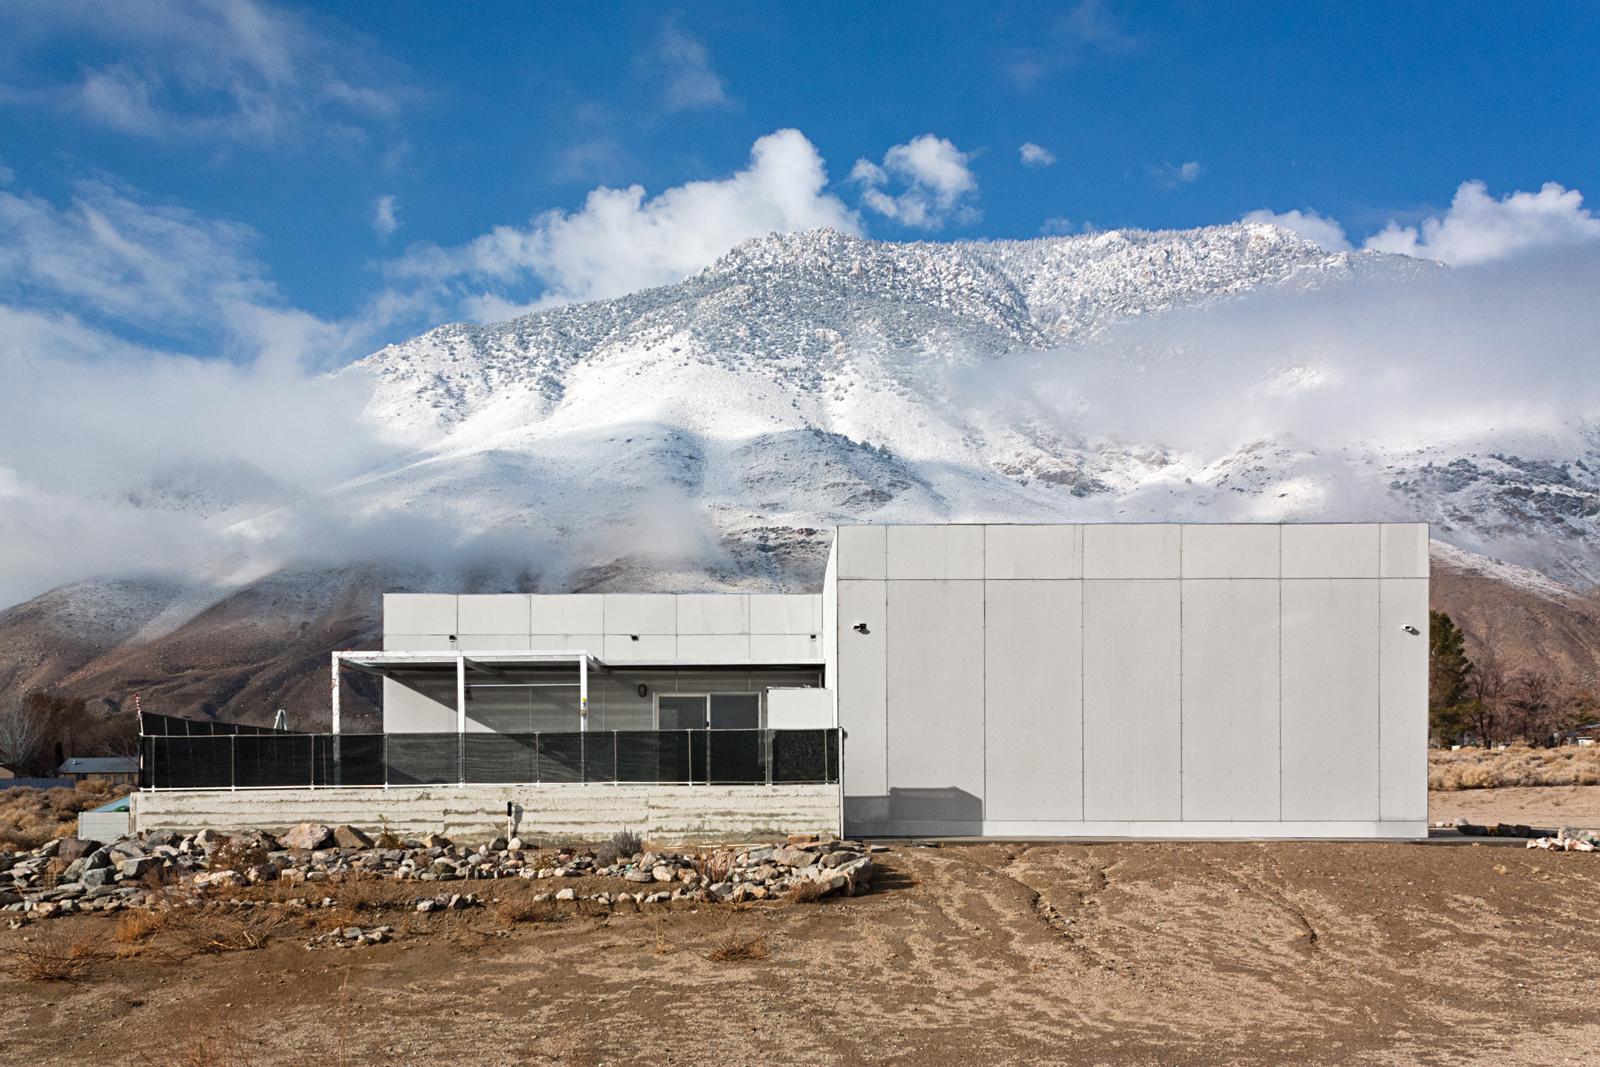 Modern prefab house in the Sierra Nevada mountains